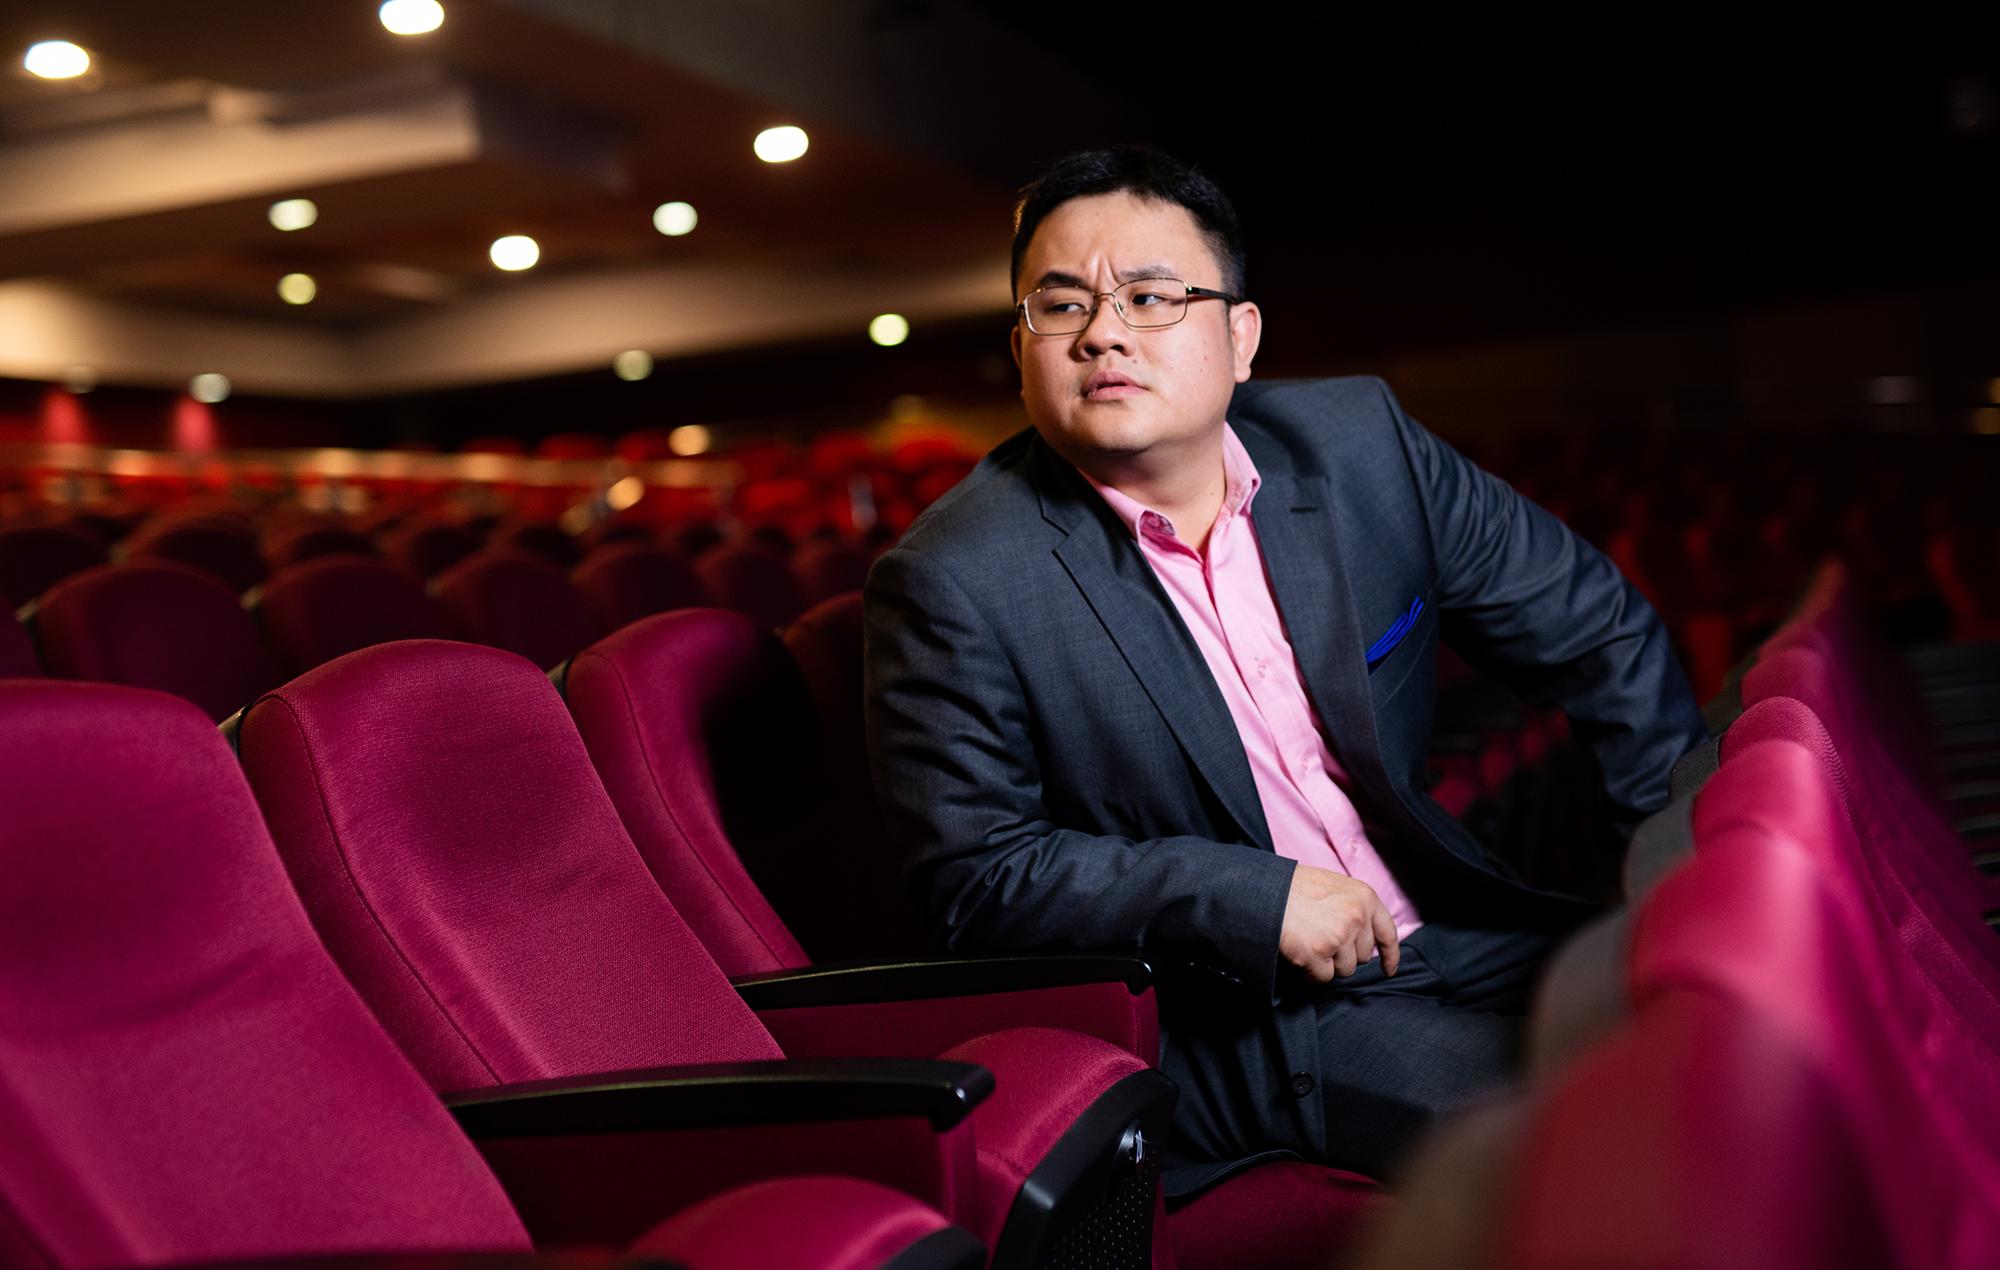 Dr. Jason Leong: Hashtag Blessed